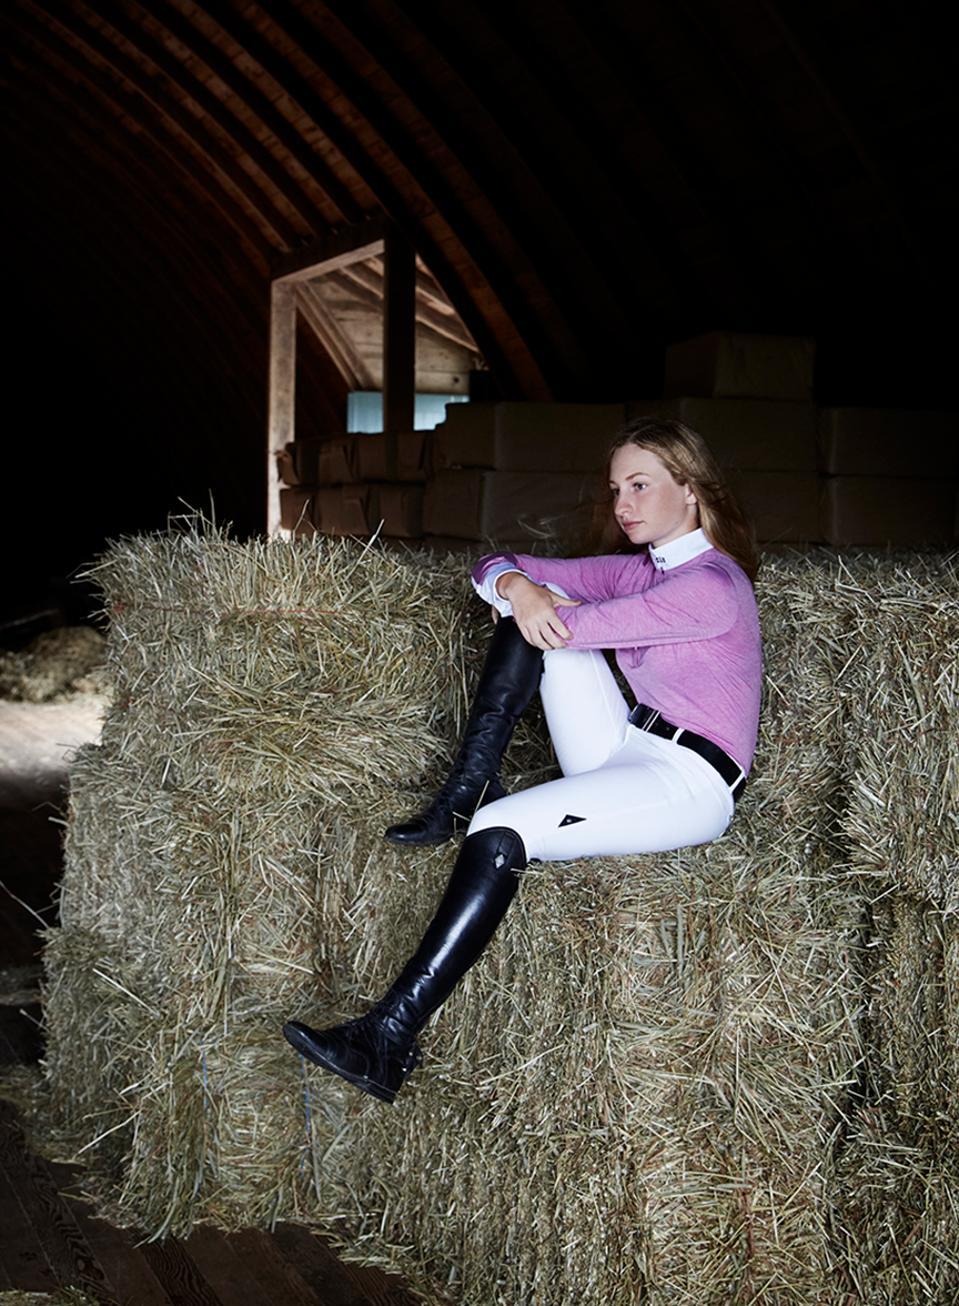 The equestrian edit